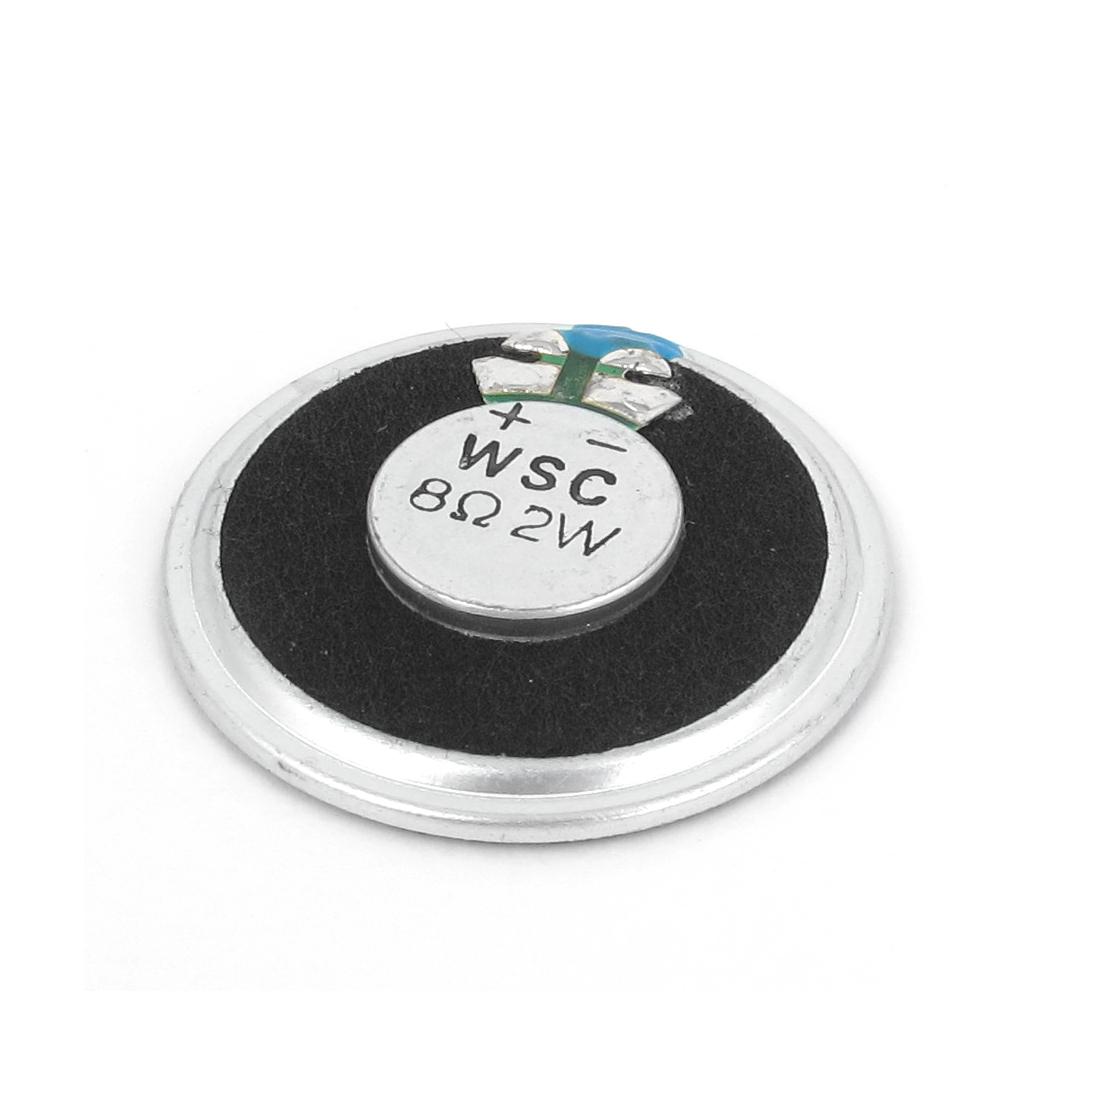 Electronic Toys 40mm Diameter Round Internal Magnet Speaker 8 Ohm 2W